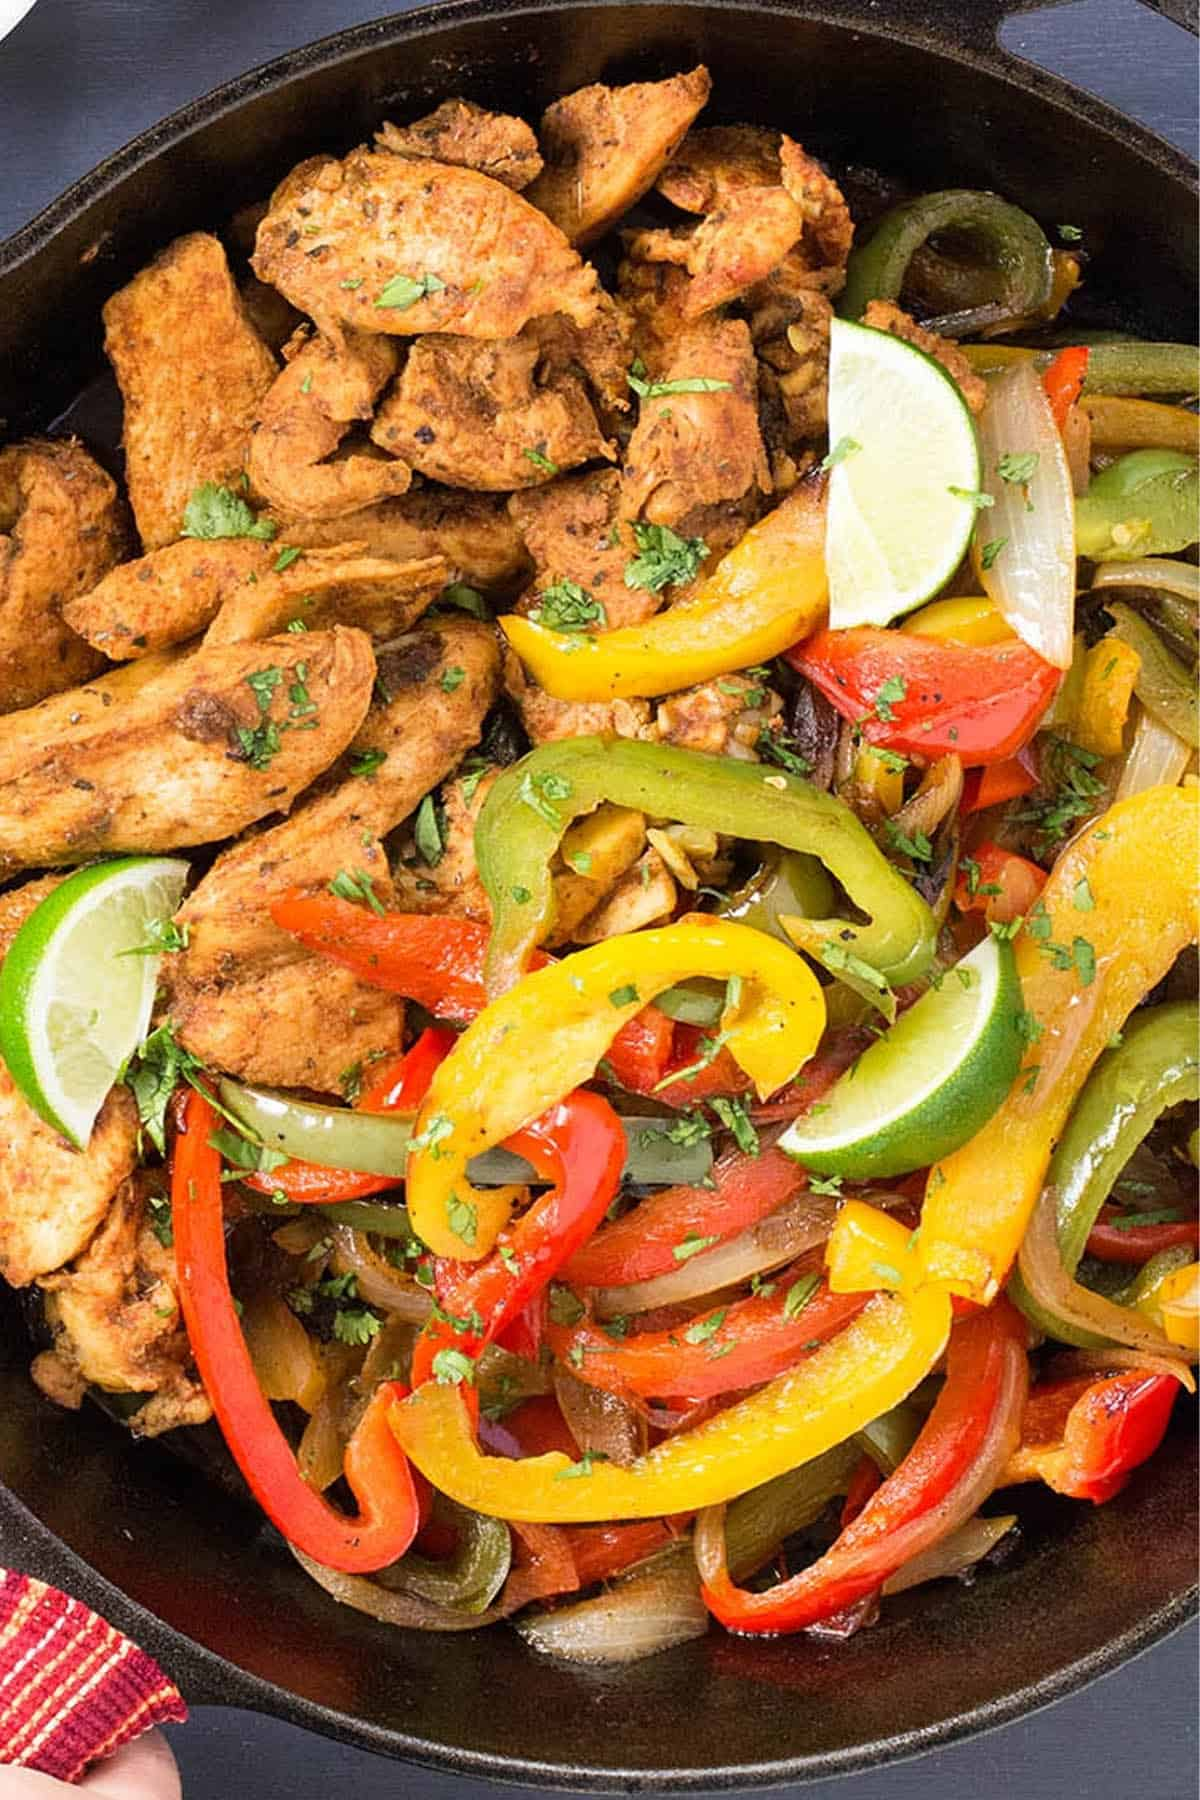 Juicy Braised Chicken Fajitas